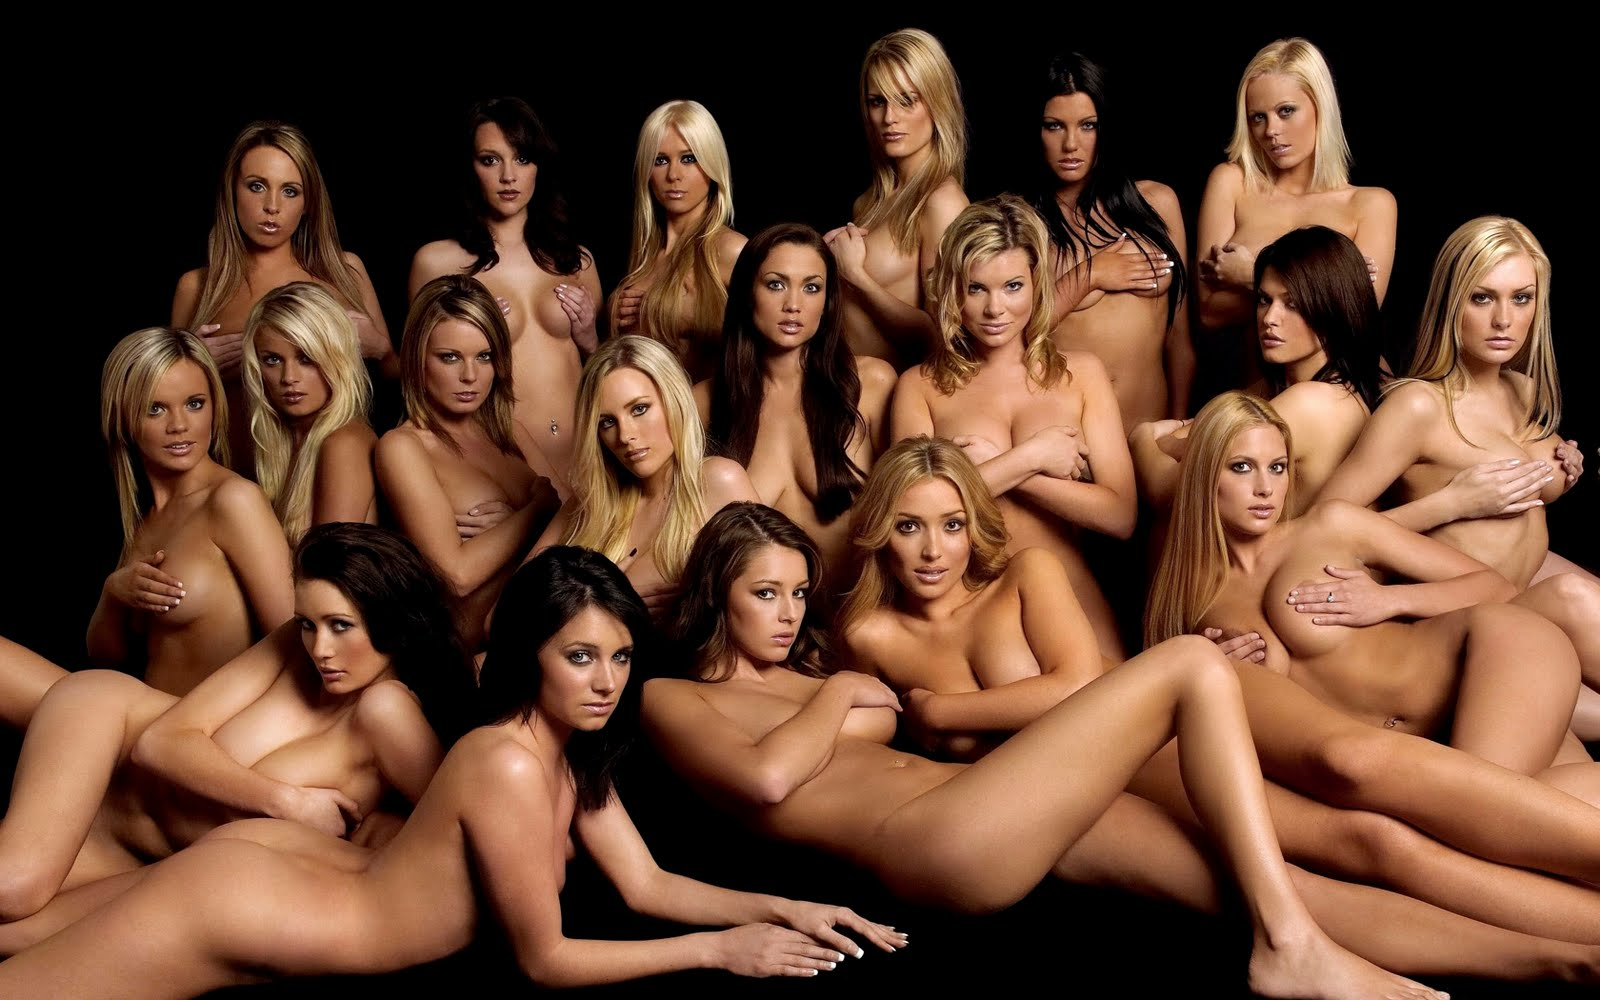 Group Of Hot Women 78